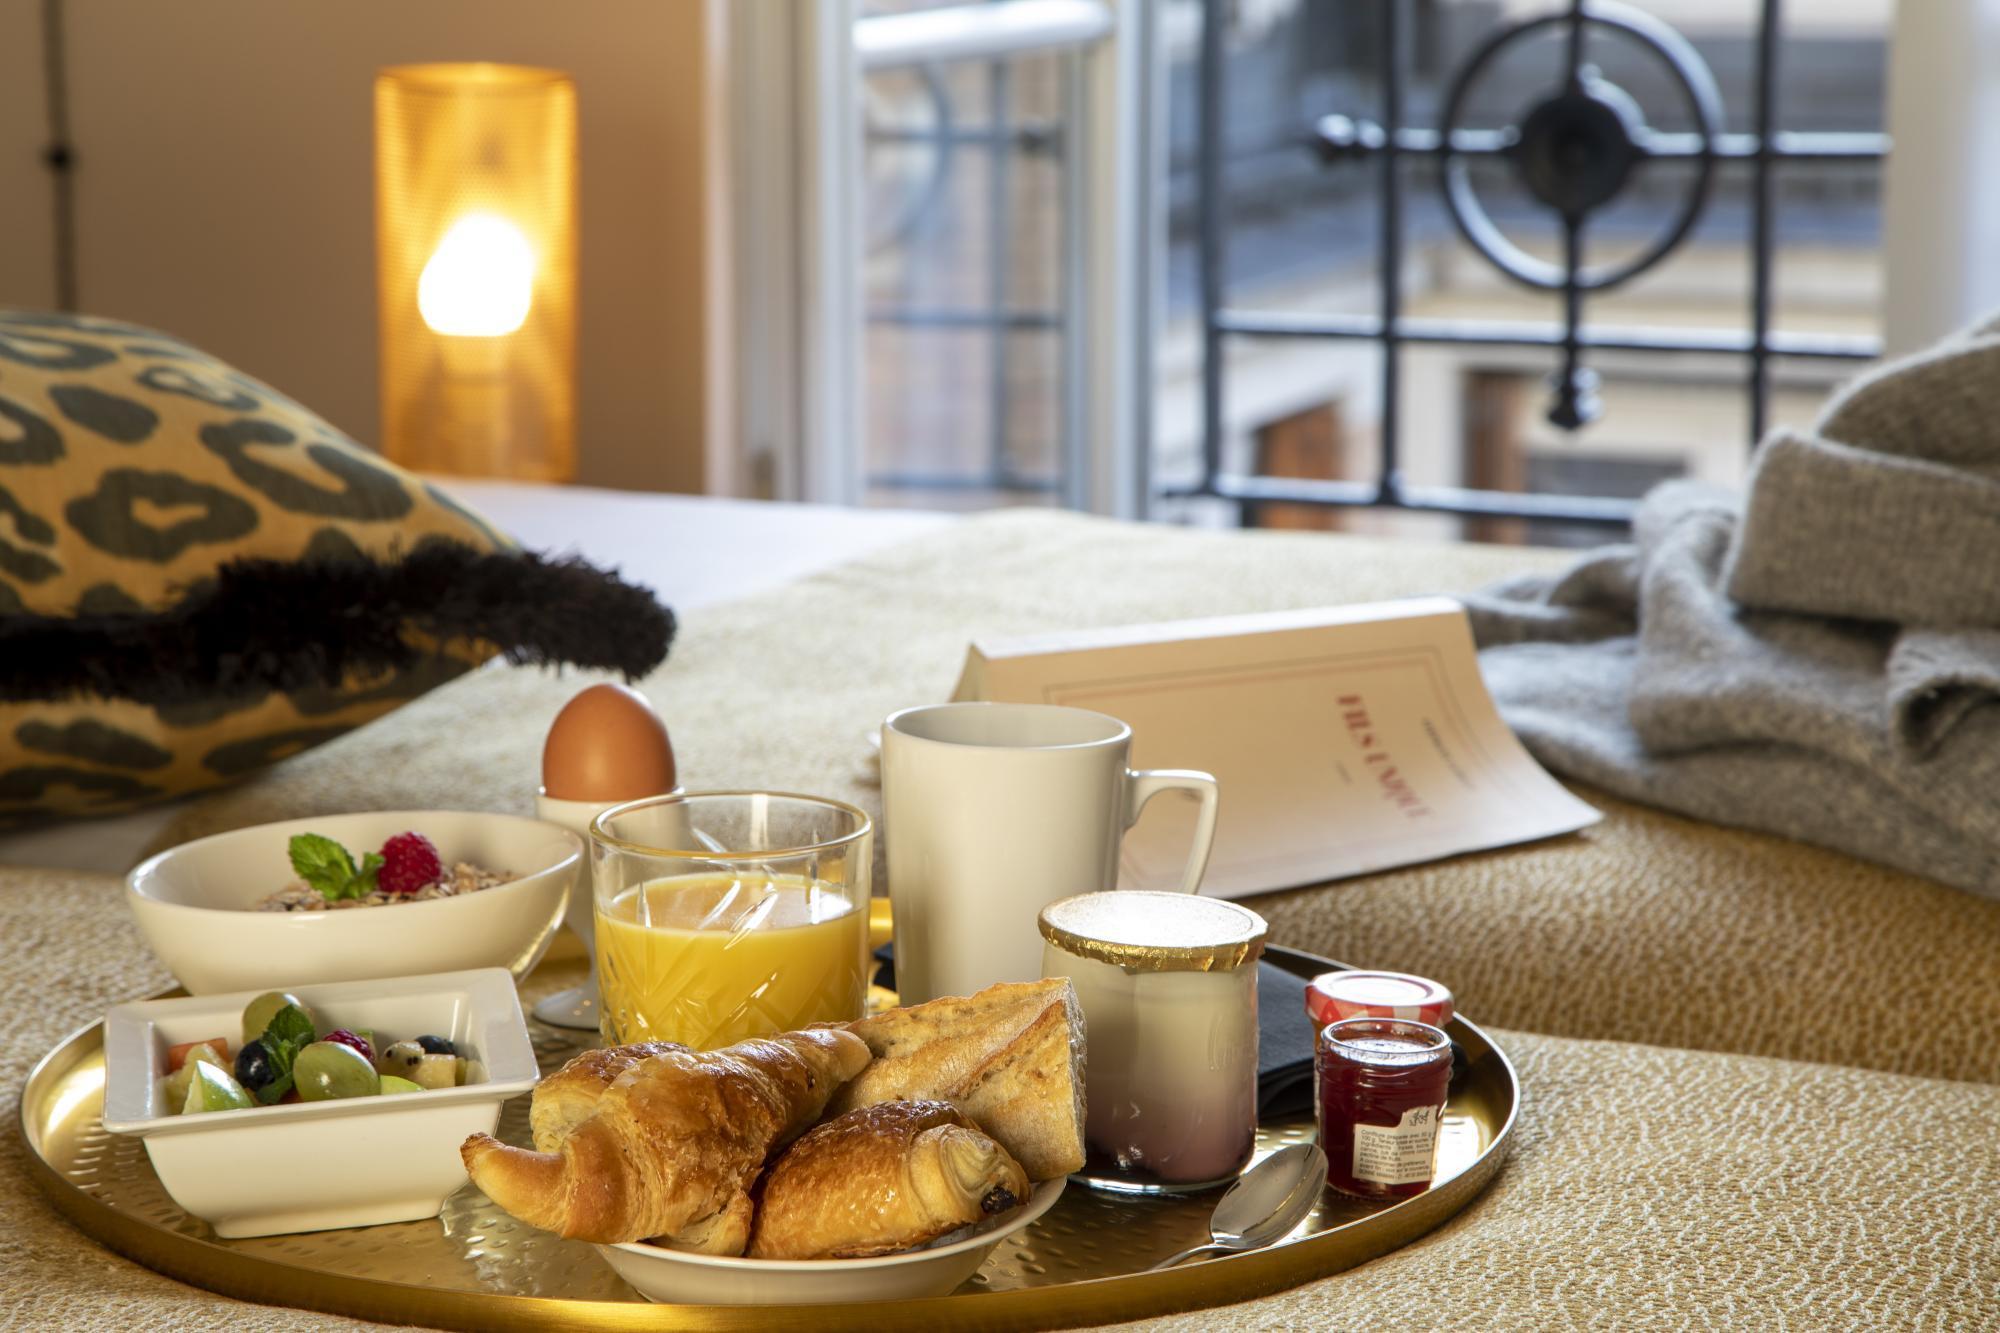 Grand Hotel Chicago Breakfast